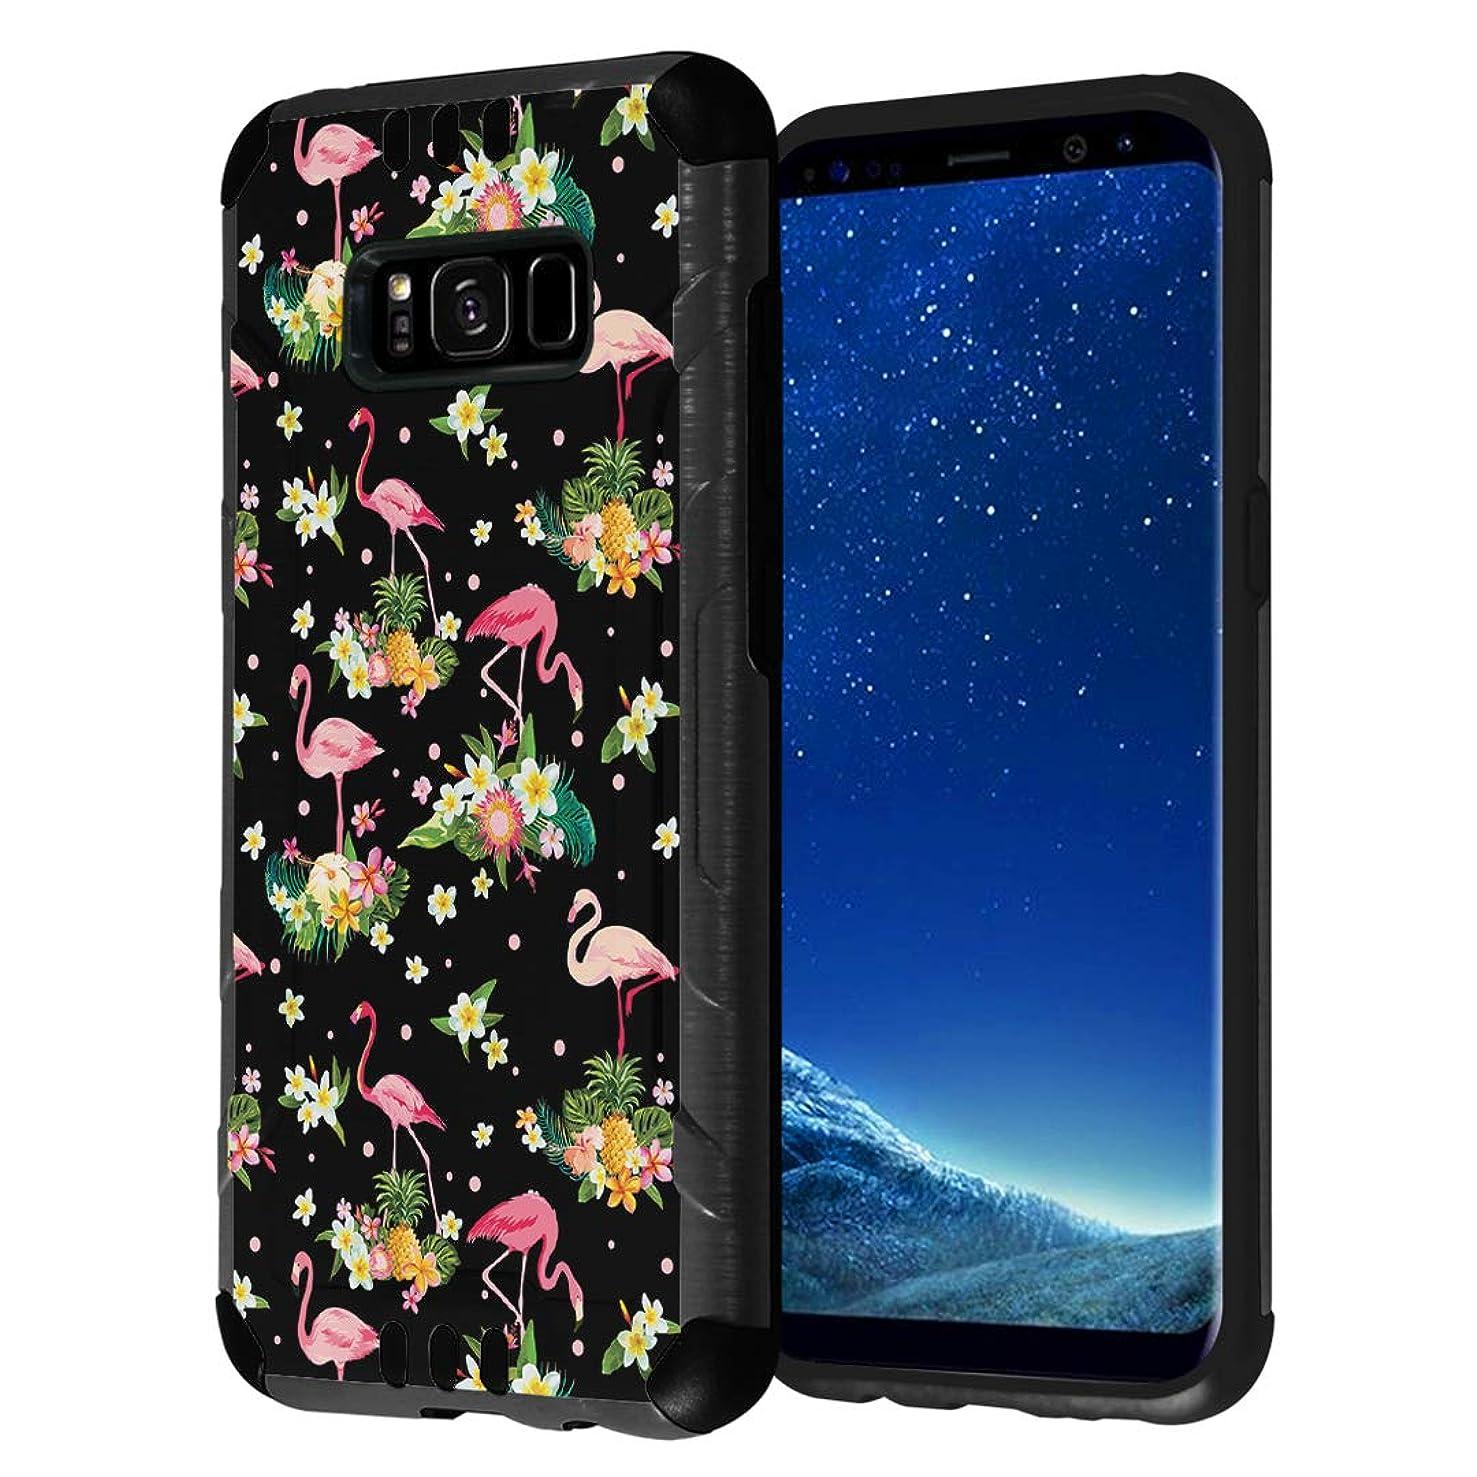 Capsule Case Compatible with Galaxy S8 [Hybrid Fusion Dual Layer Slick Armor Cushion Case Black] for Samsung Galaxy S8 SM-G950 SPHG950 - (Flamingo)